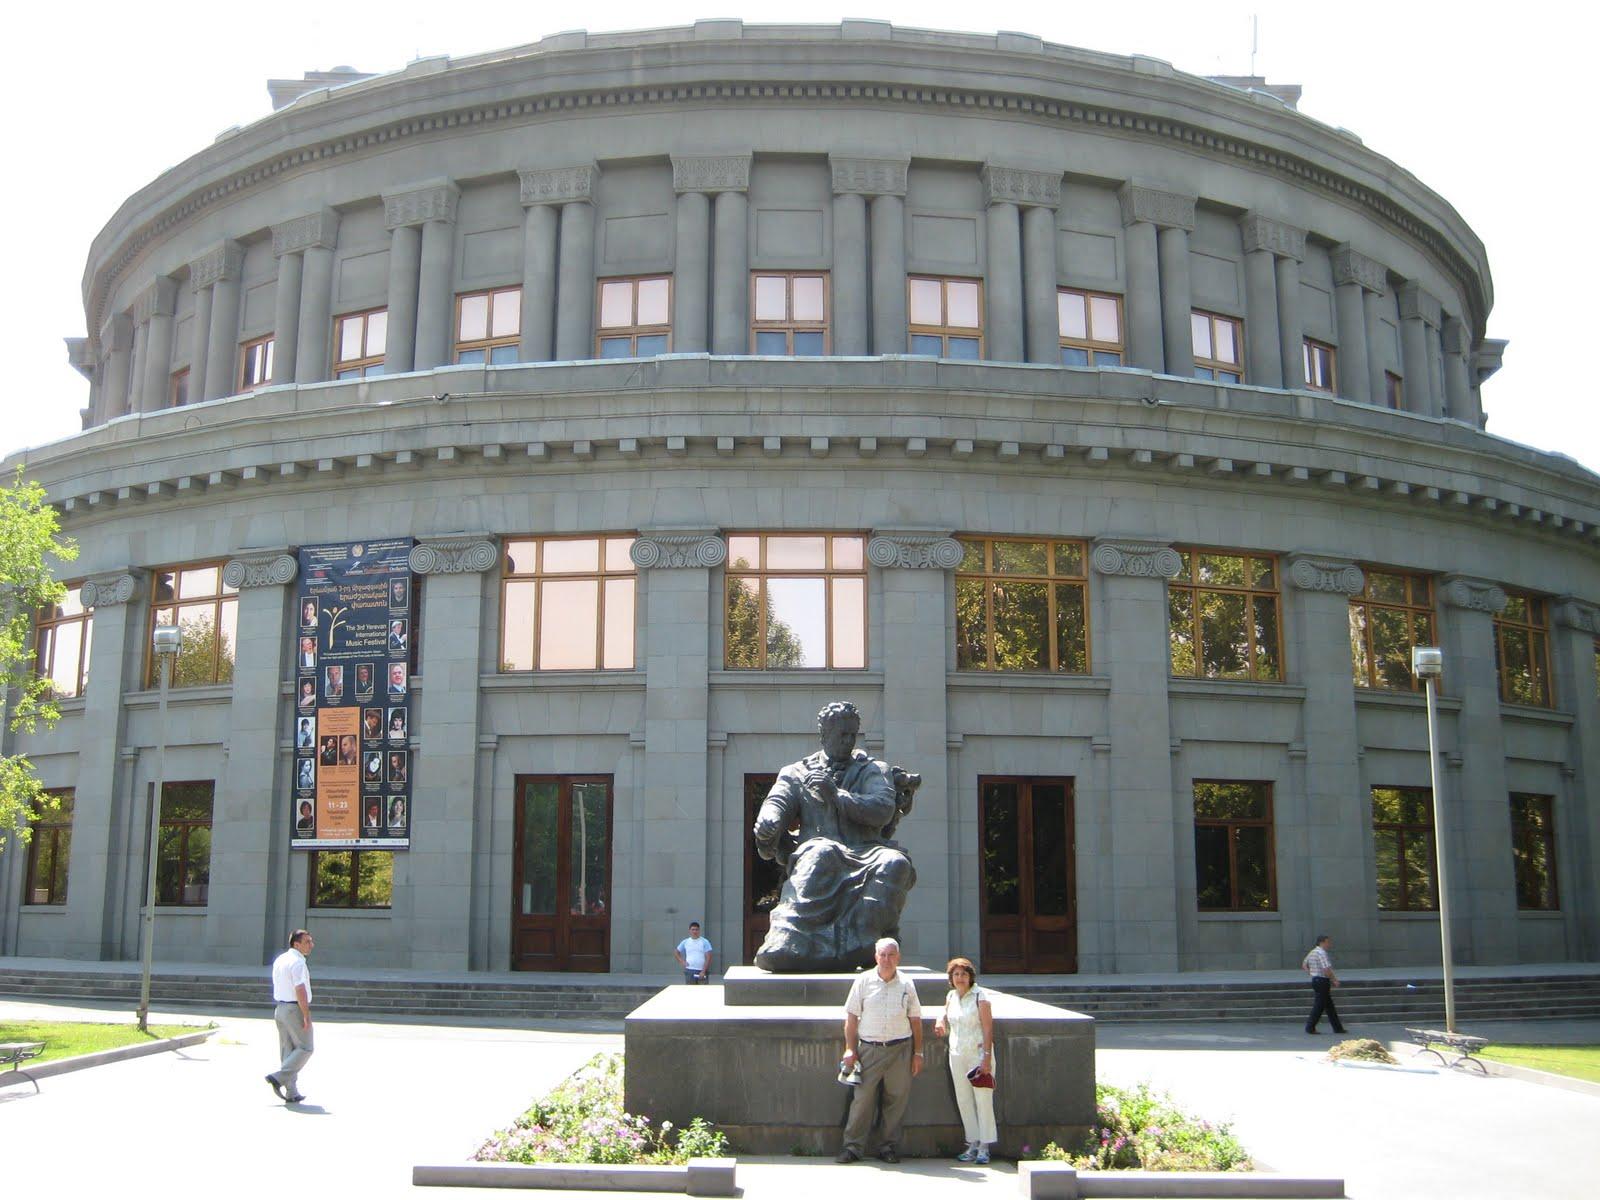 Armenia Tourist Places  Yerevan City Pictures  Cini Clips-2619